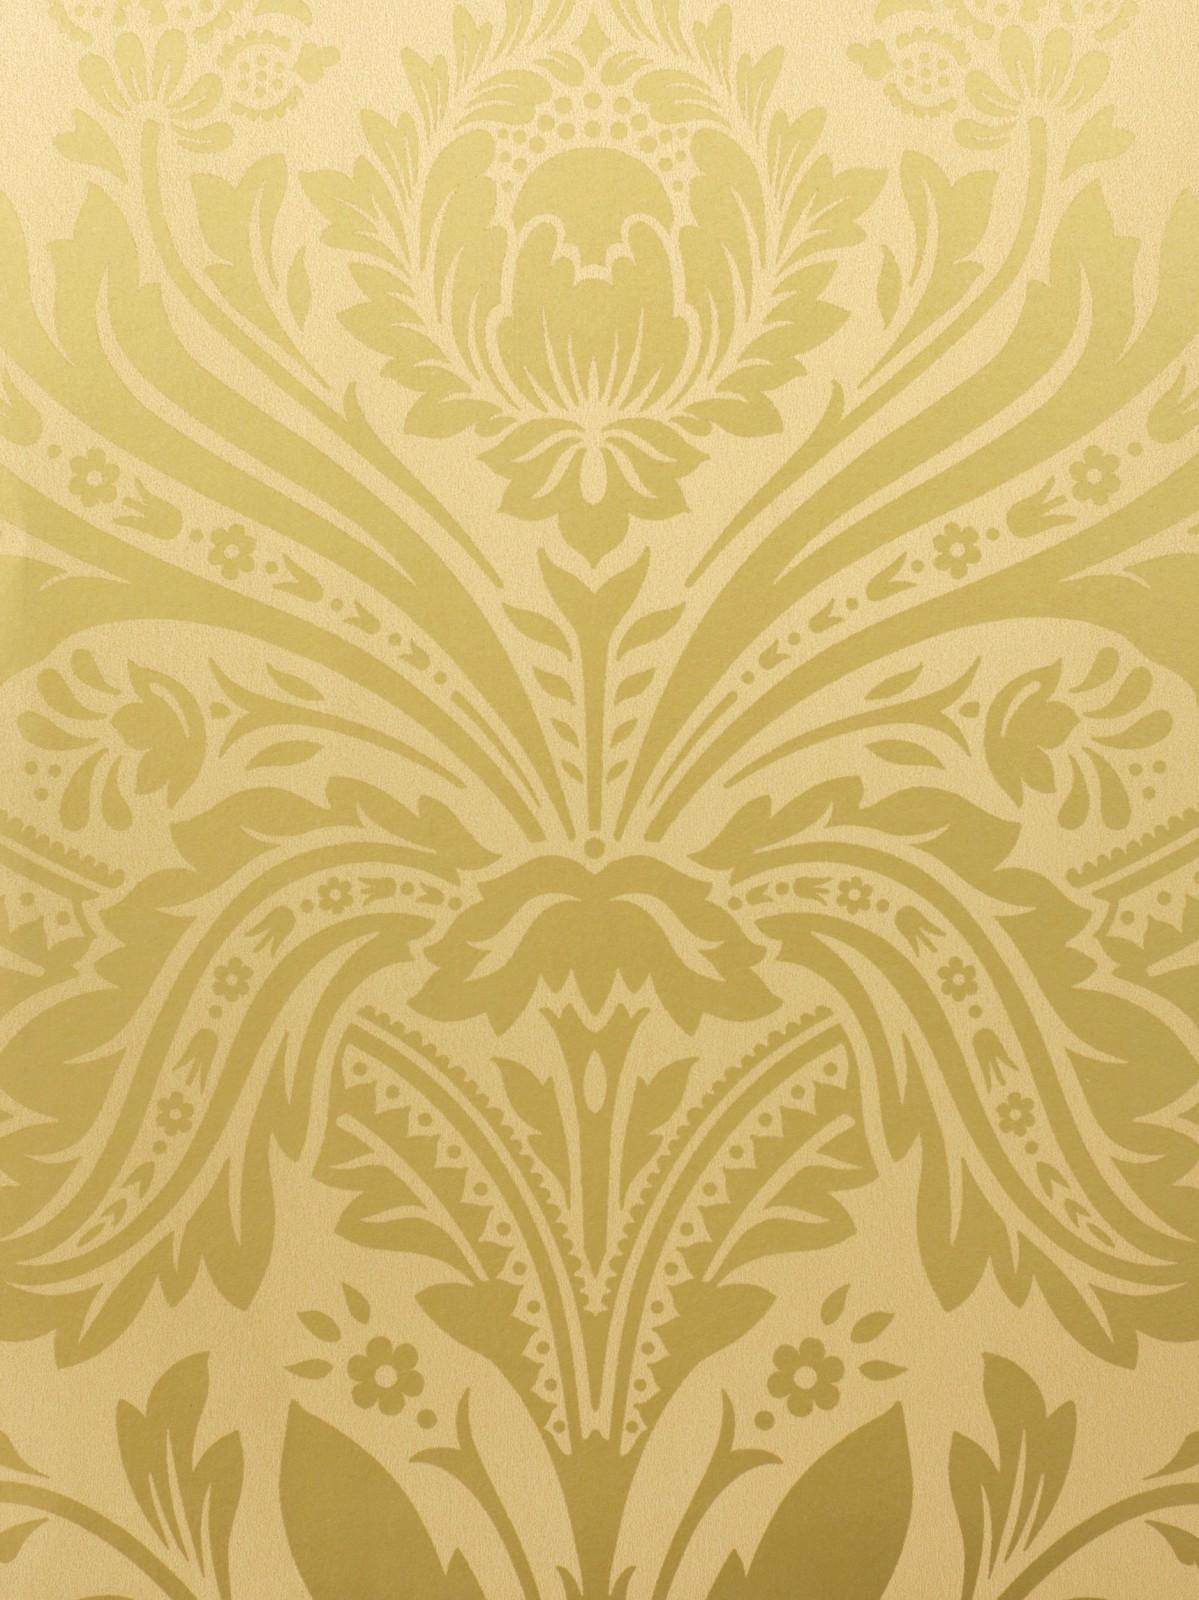 graham brown tapete 50 026 50026 neo barock tapete gold. Black Bedroom Furniture Sets. Home Design Ideas